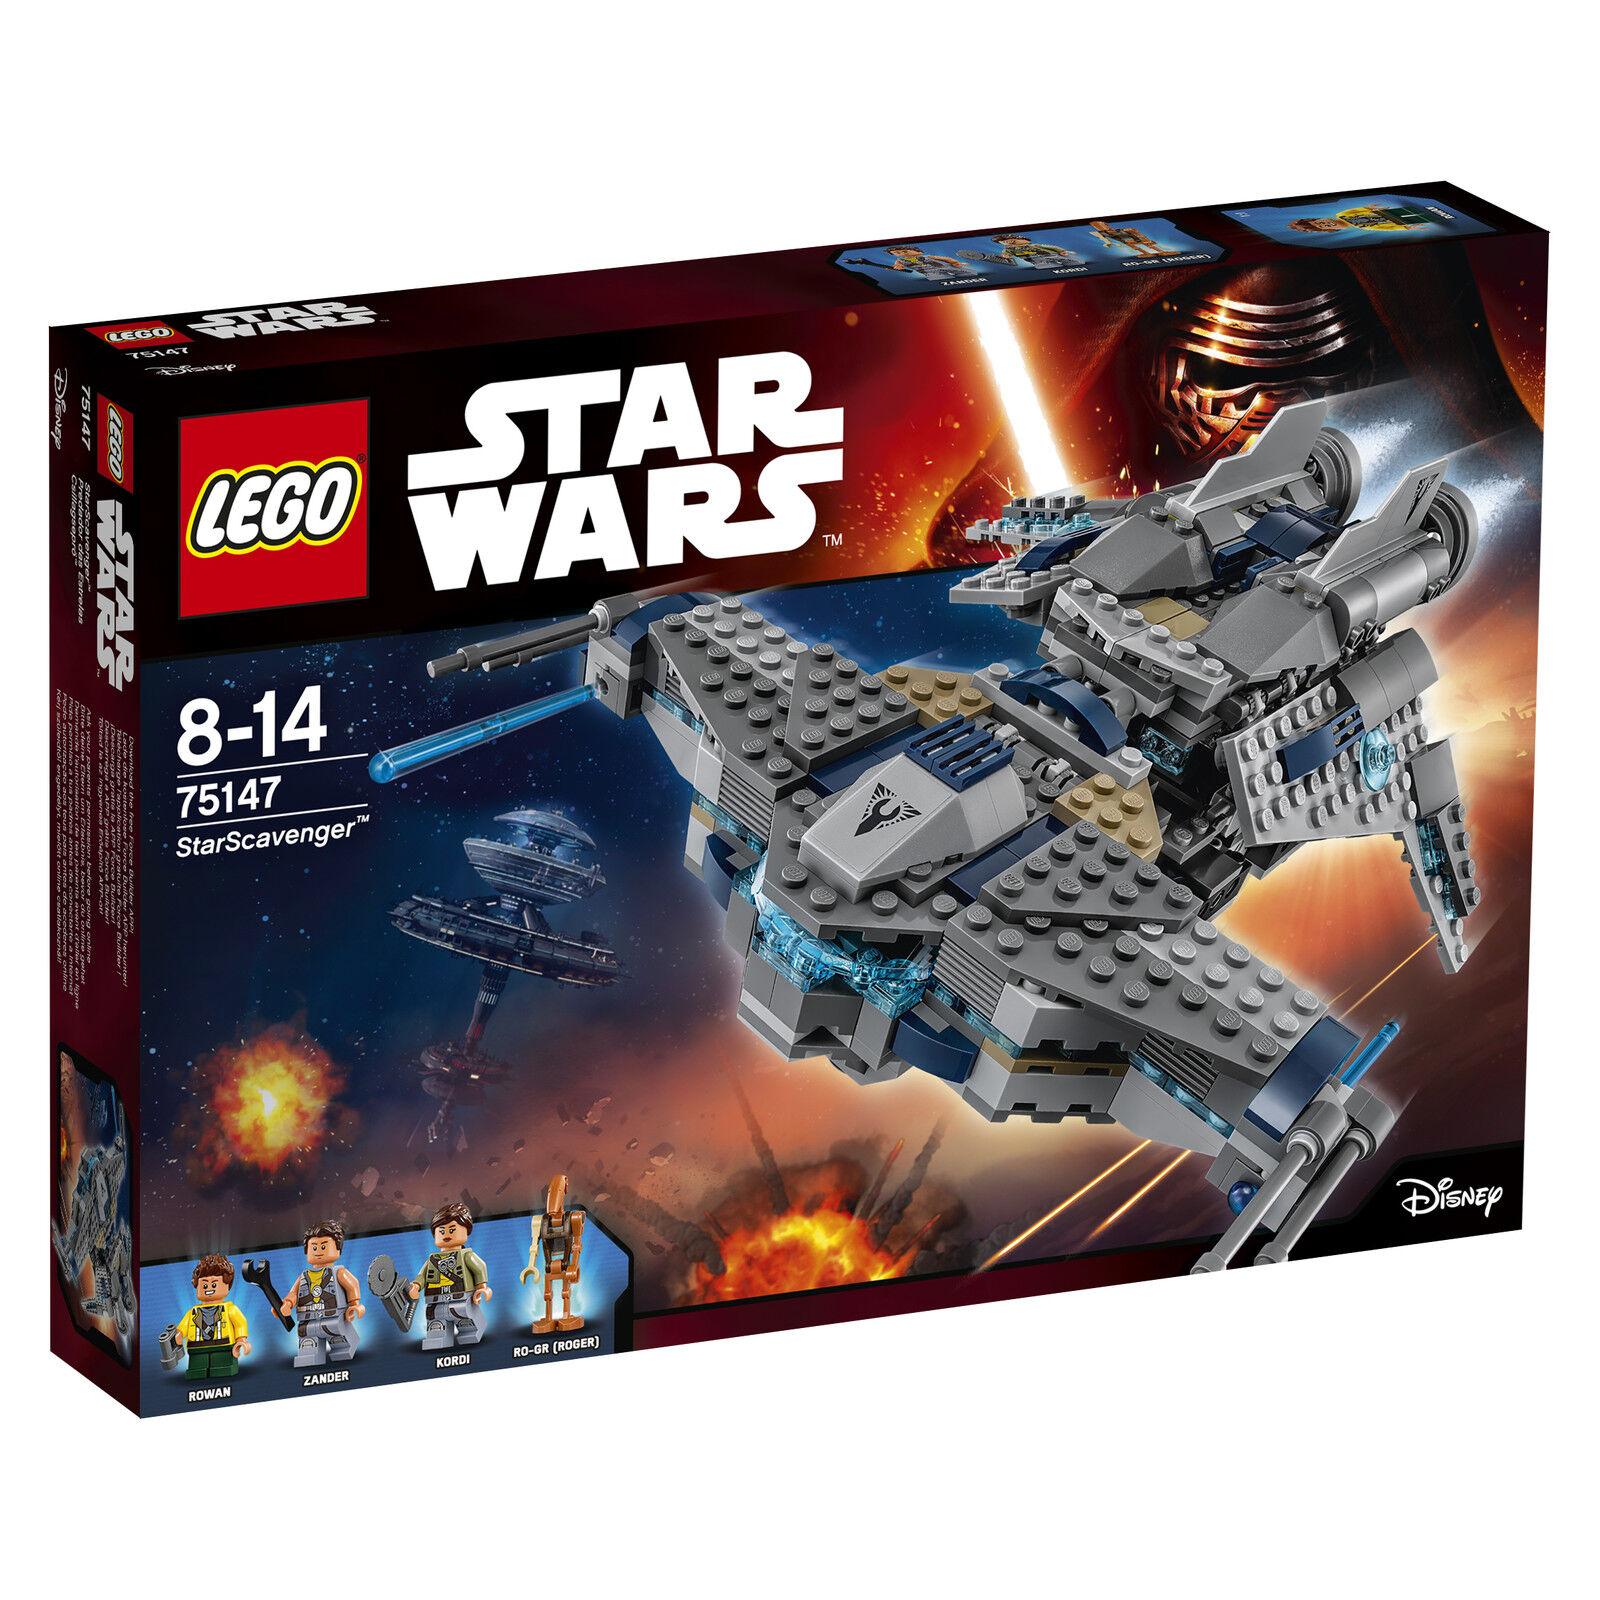 LEGO® Star Wars™ 75147 Star Scavenger™ NEU OVP NEW MISB NRFB